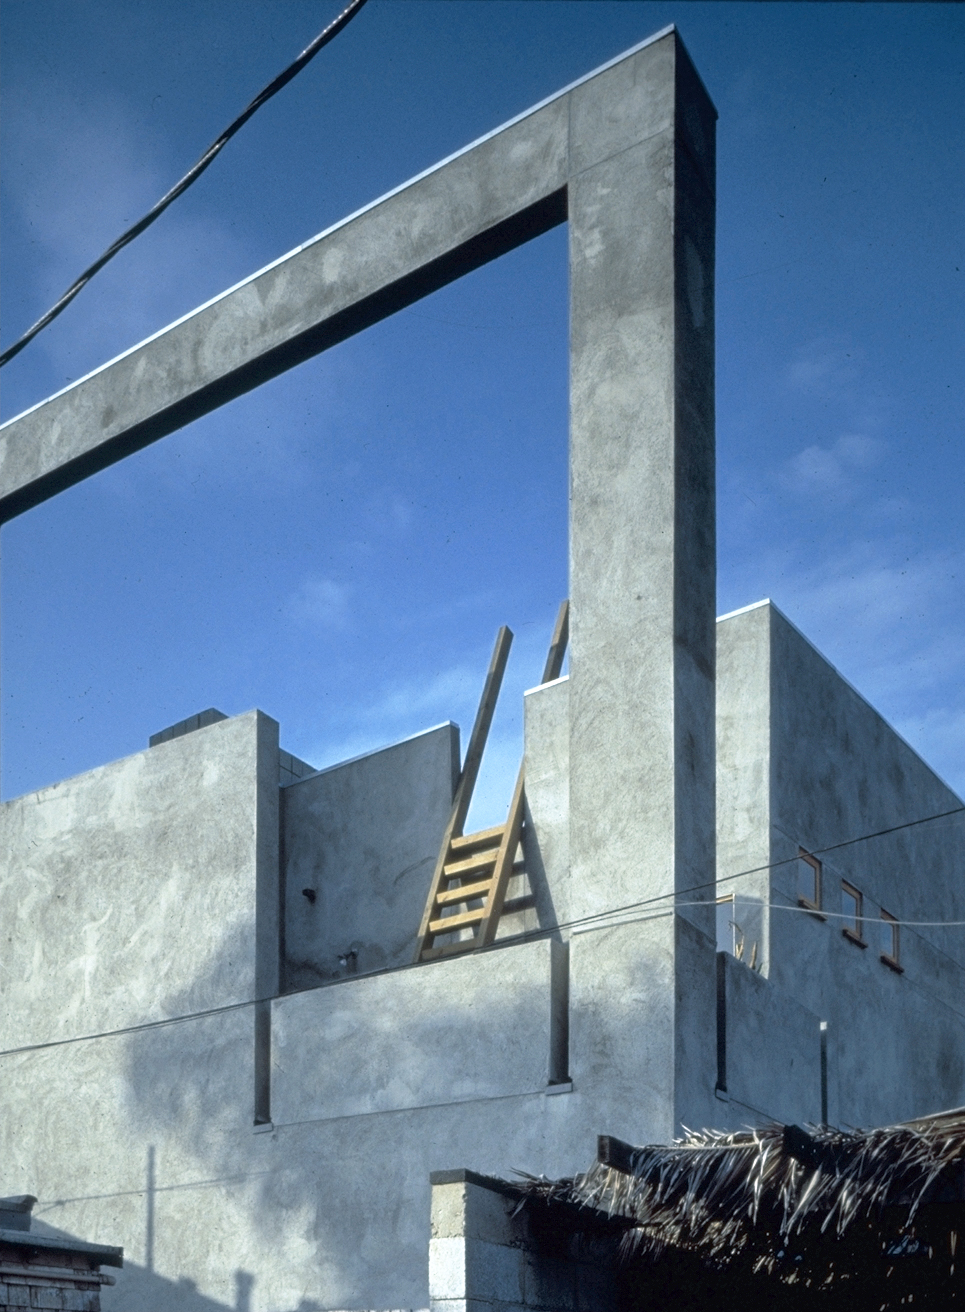 S.E.A.-Studio-Environmental-Architecture-David-Hertz-FAIA-Venable-House-Venice-Beach-sustainable-regenerative-restorative-design-residential-contemporary-modern-passive-systems-recycled-wood-concrete-green-building-canal-beachhouse-studioea-3.jpg